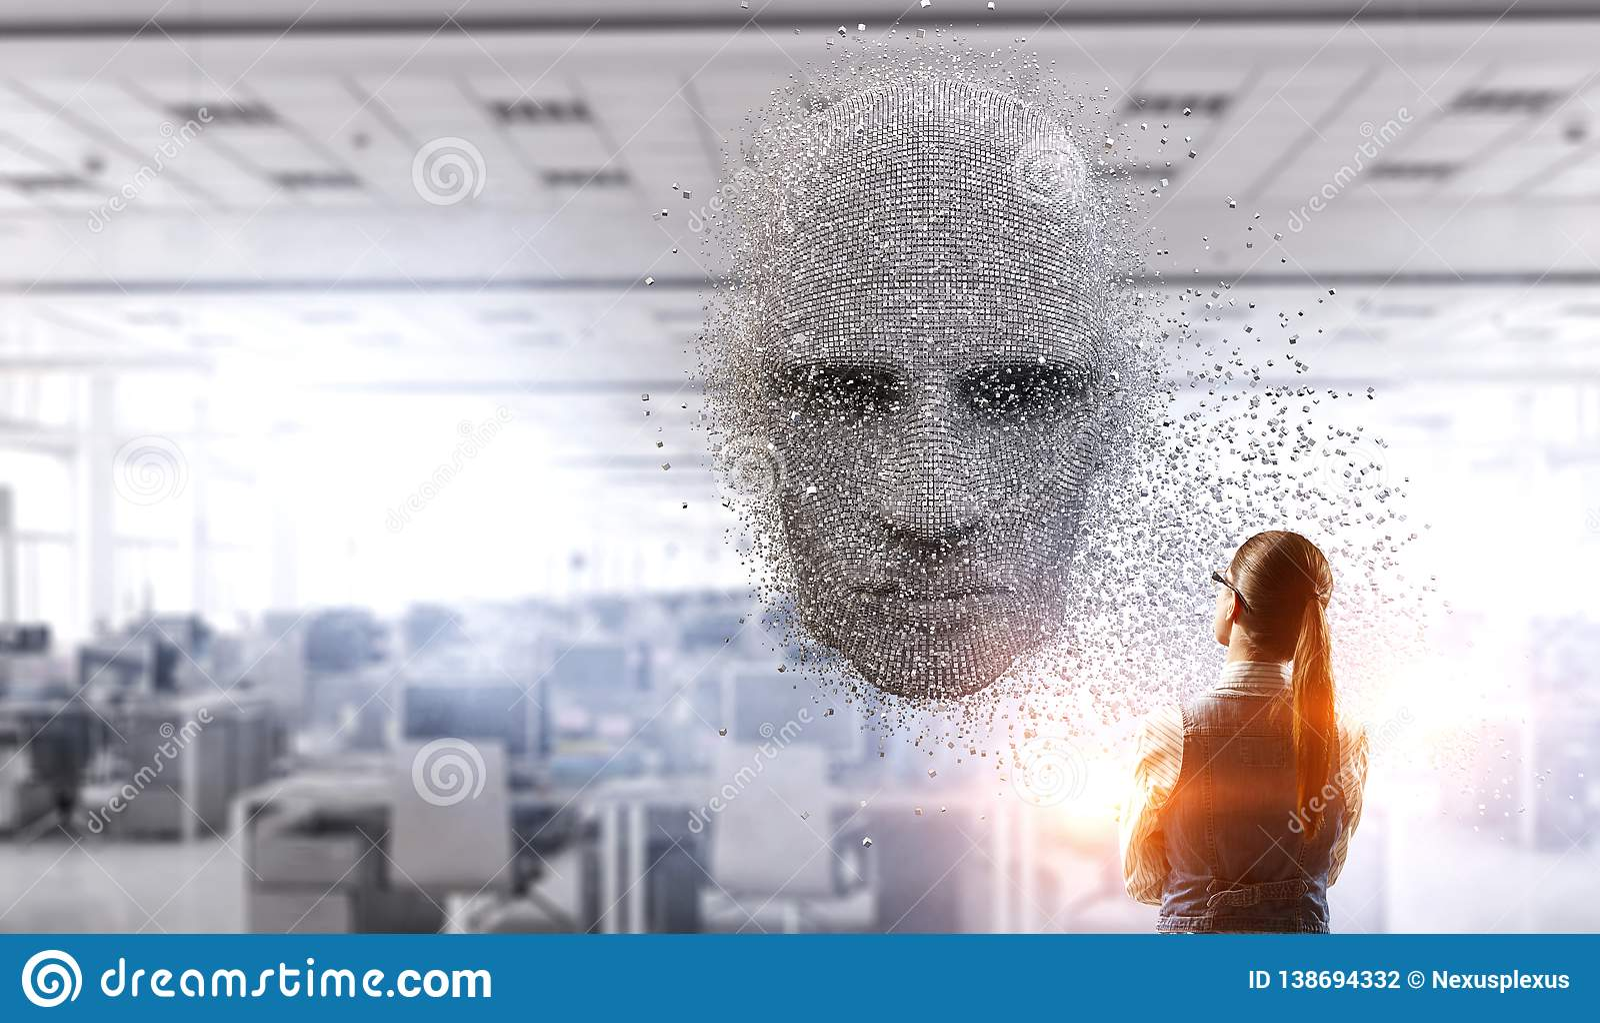 Kunstmatige intelligentie en toekomstige technologieën Gemengde media